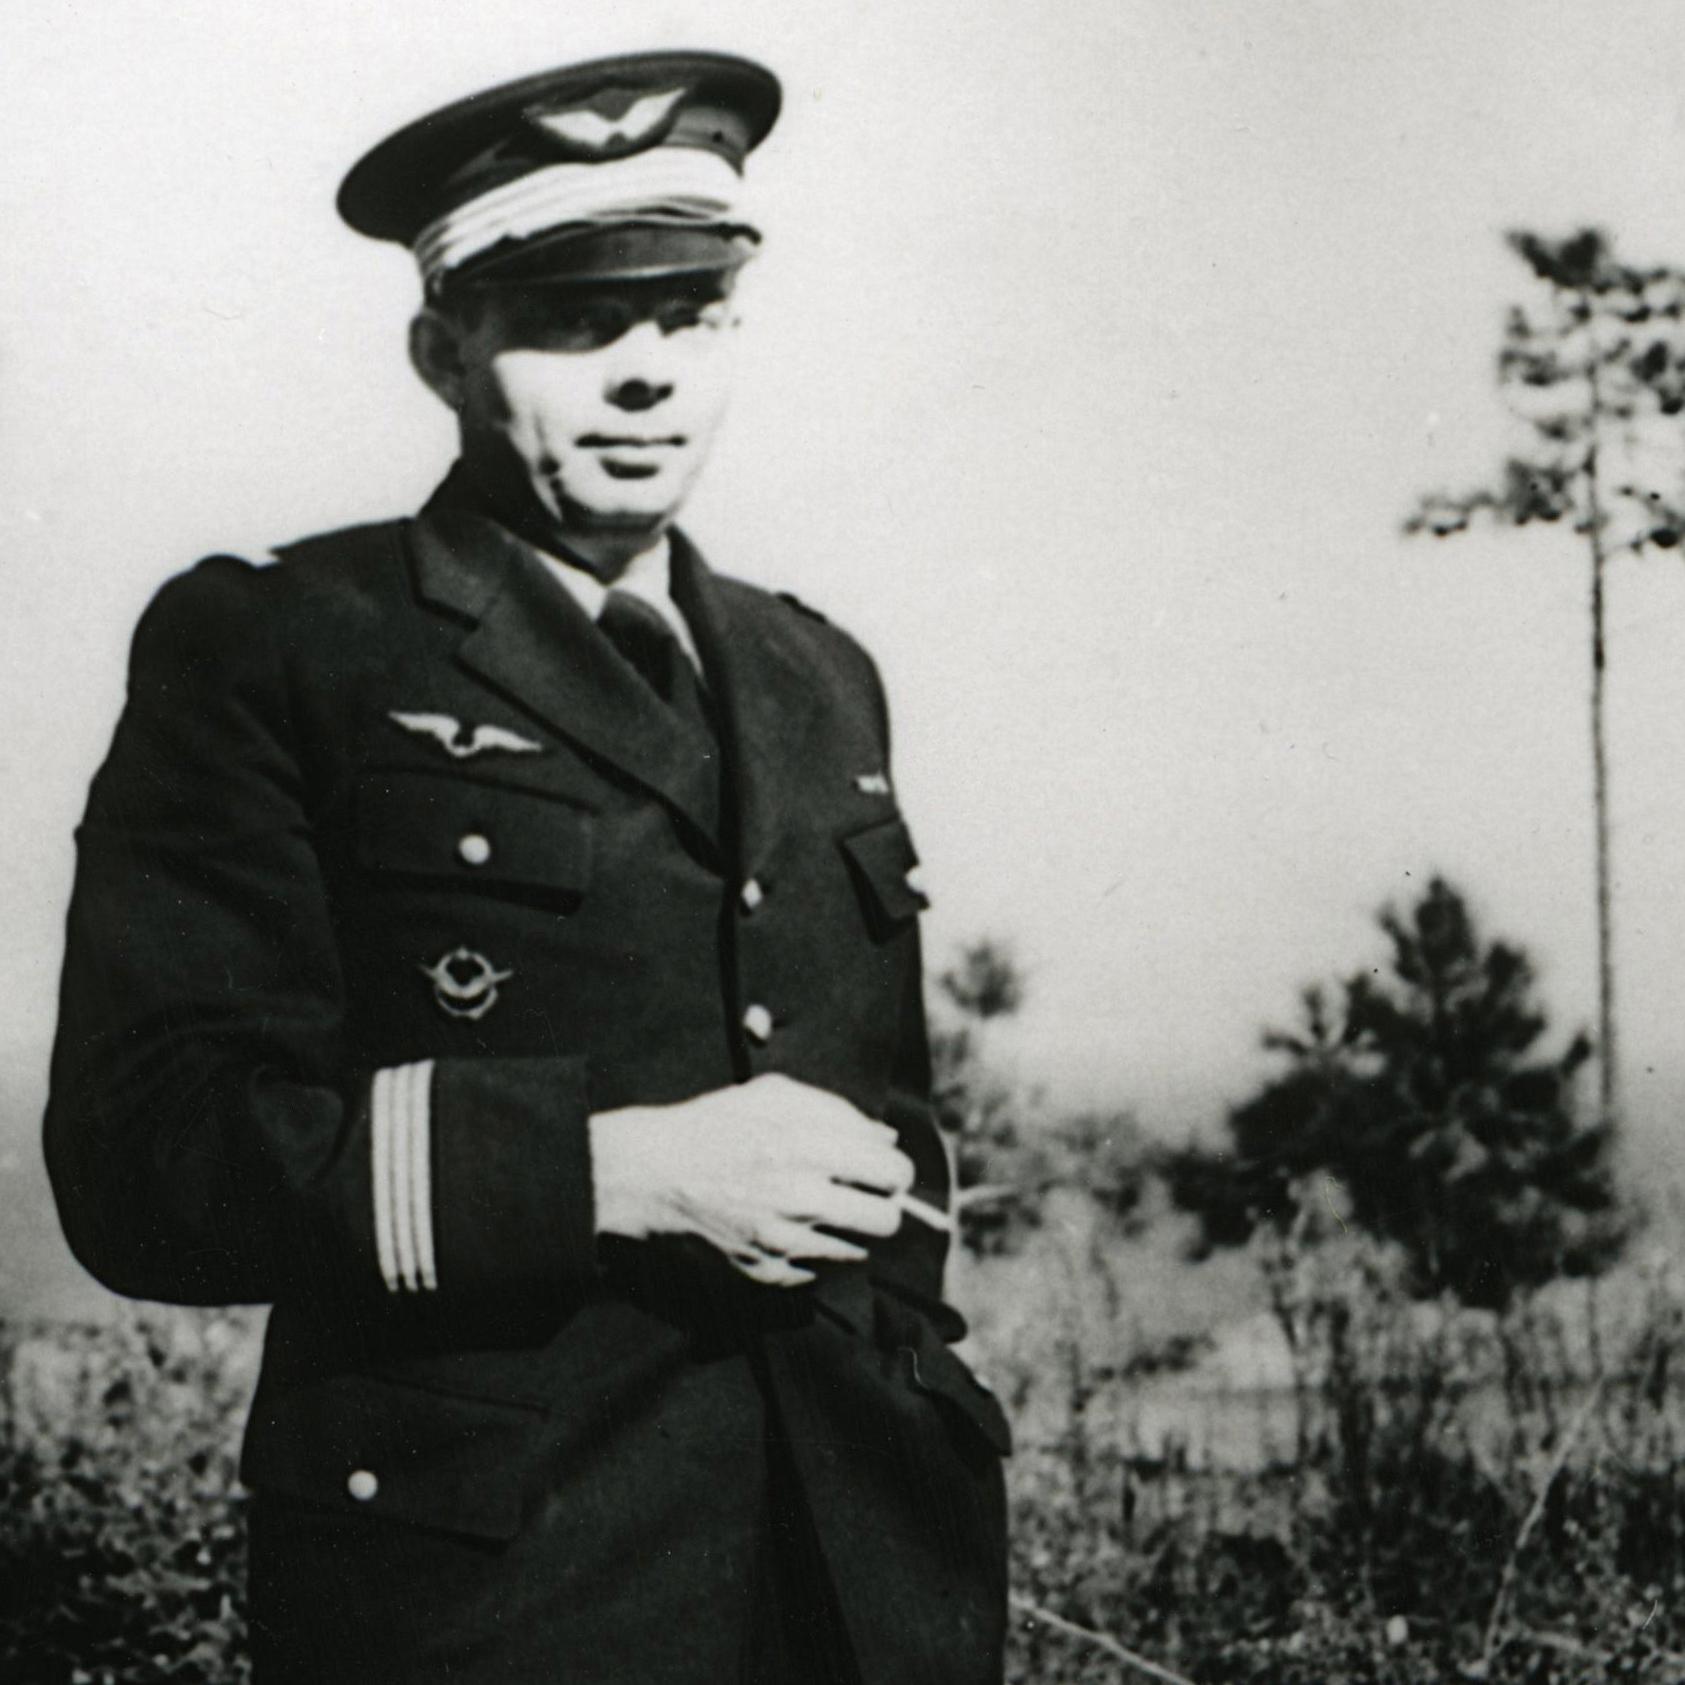 ASE-1940-Pilote_de_guerre-4.jpg